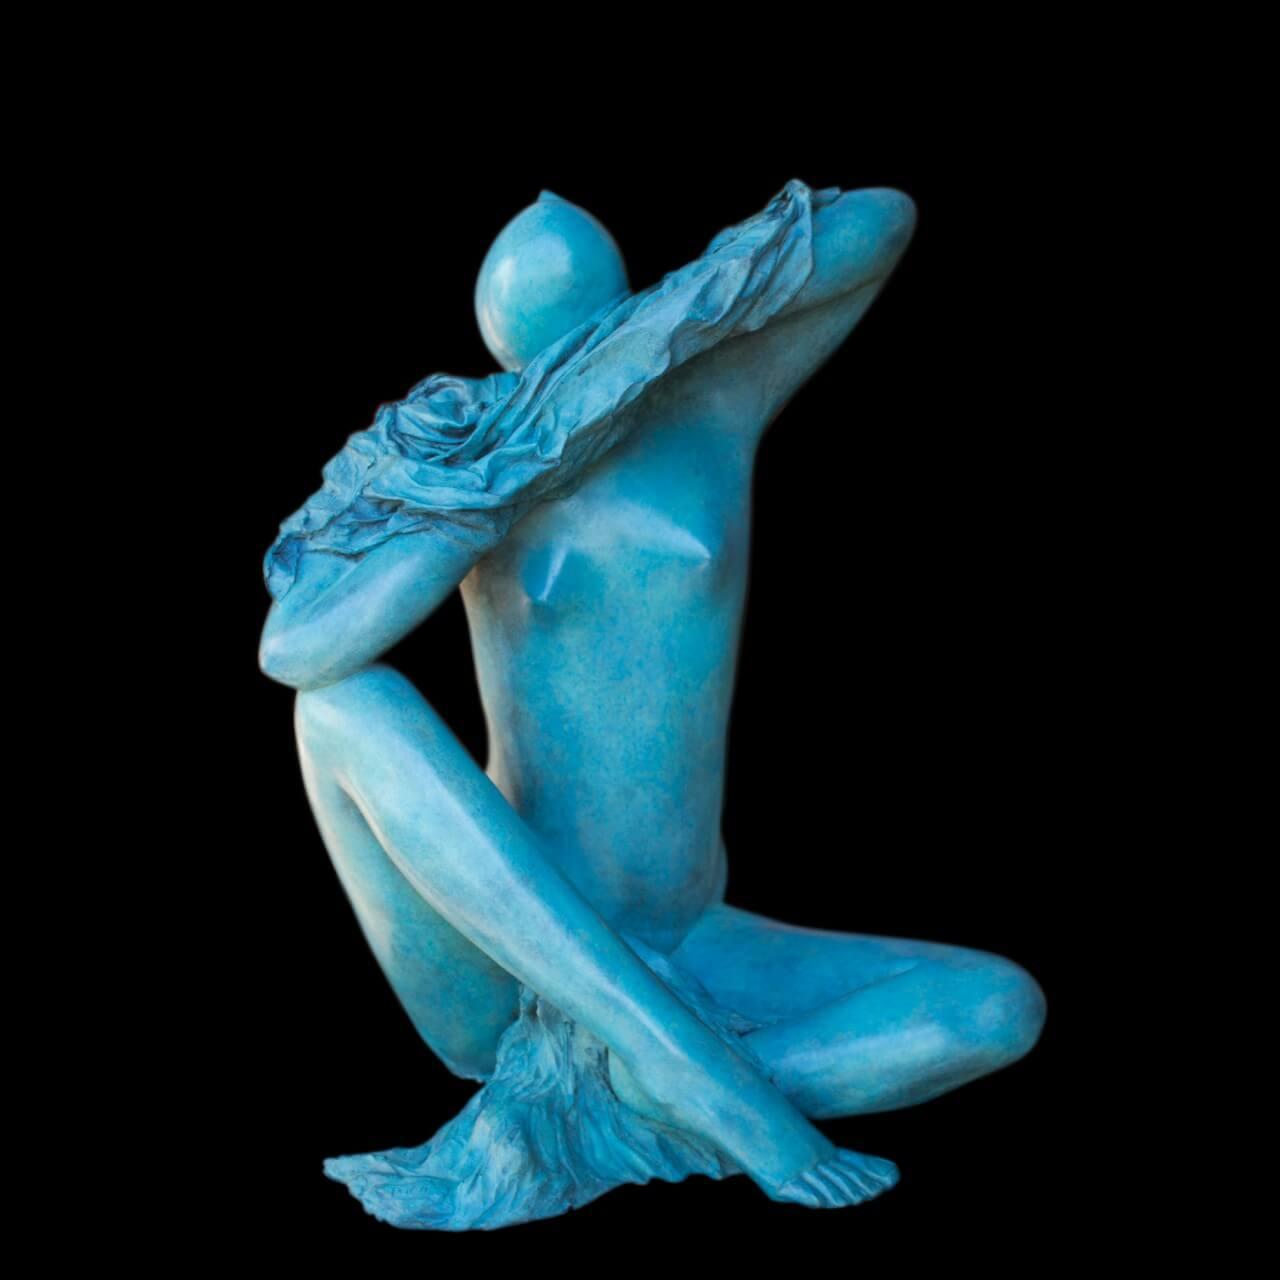 mario pavesi italian sculptur painter female Woman